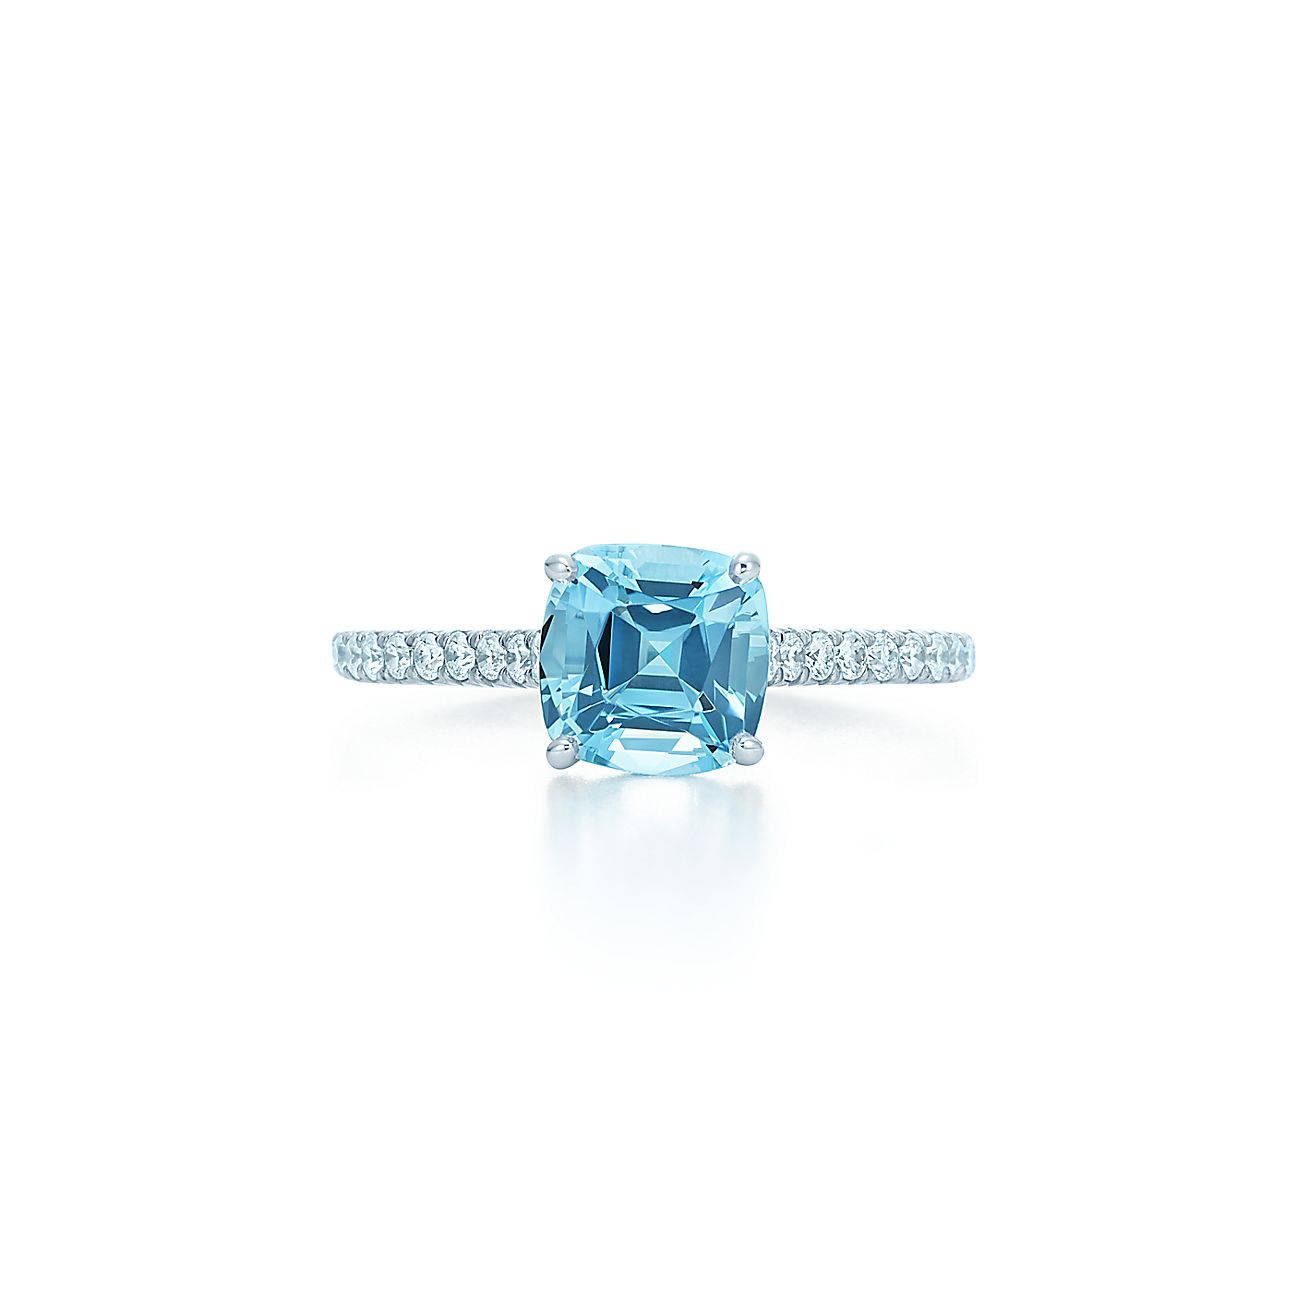 Aquamarine Jewelry Tiffany Tiffany Legacy Aquamarine